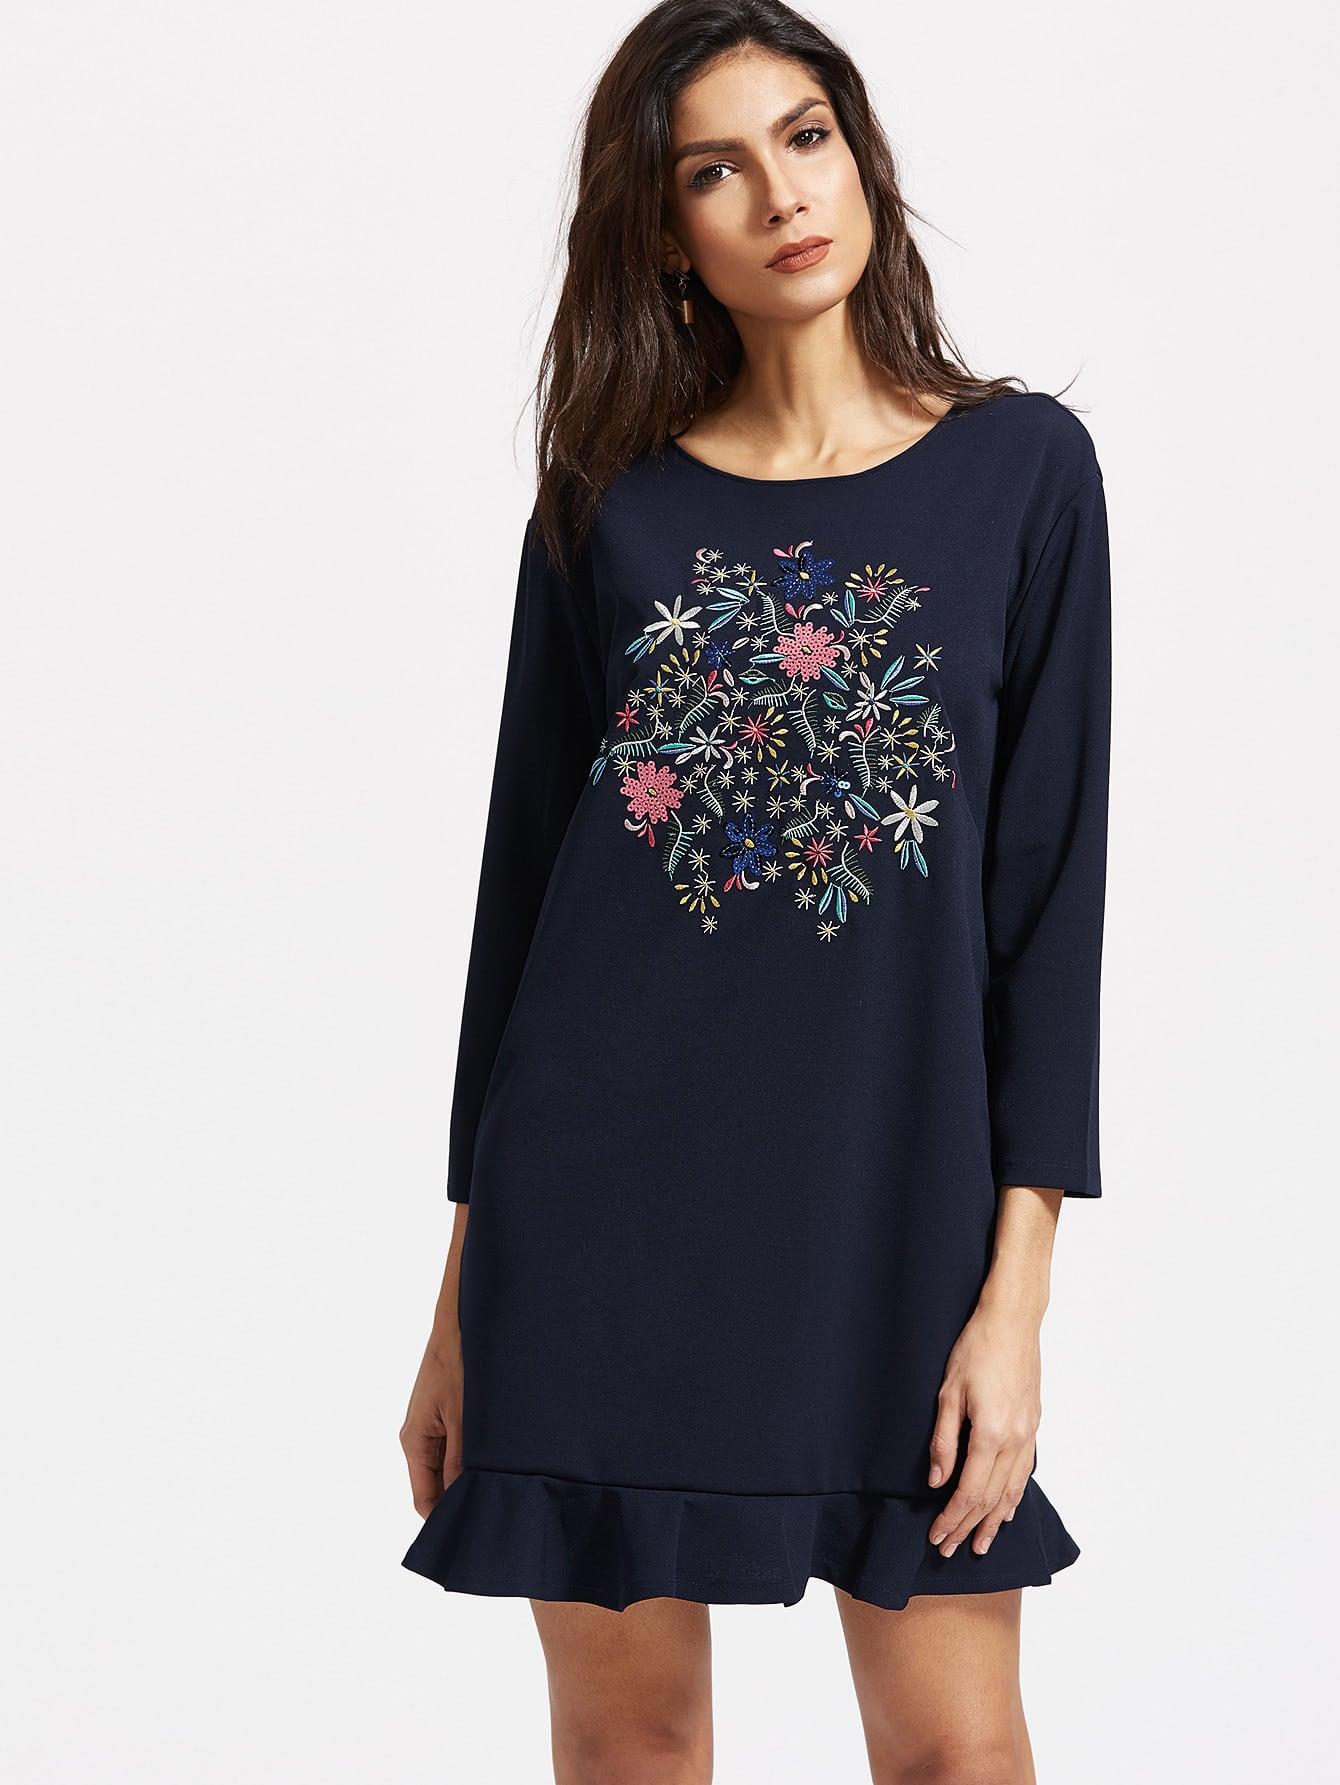 Navy Flower Embroidery Ruffle Hem Dress dress170303201